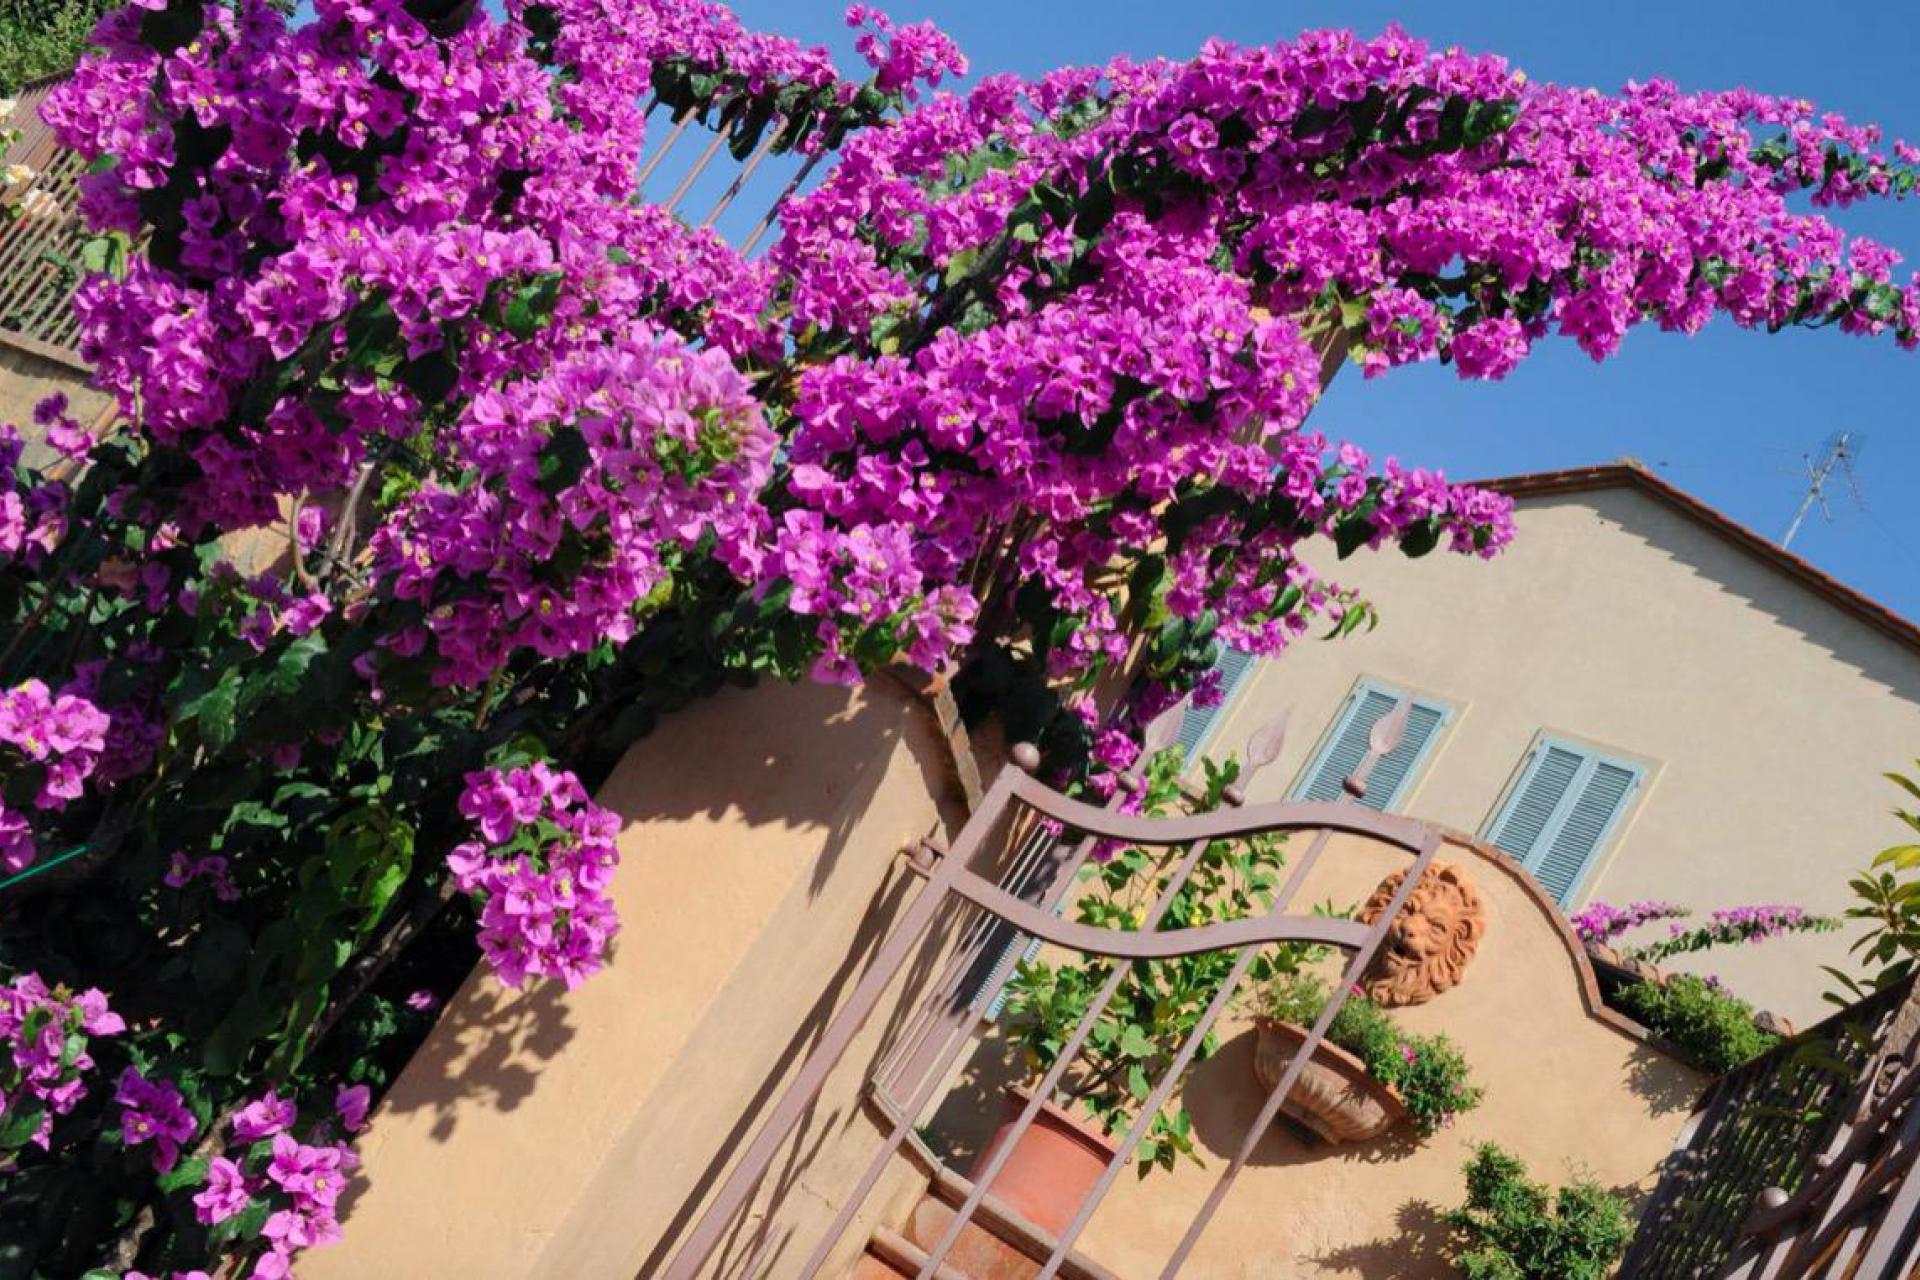 Agriturismo Tuscany Small luxury agriturismo near Volterra in Tuscany